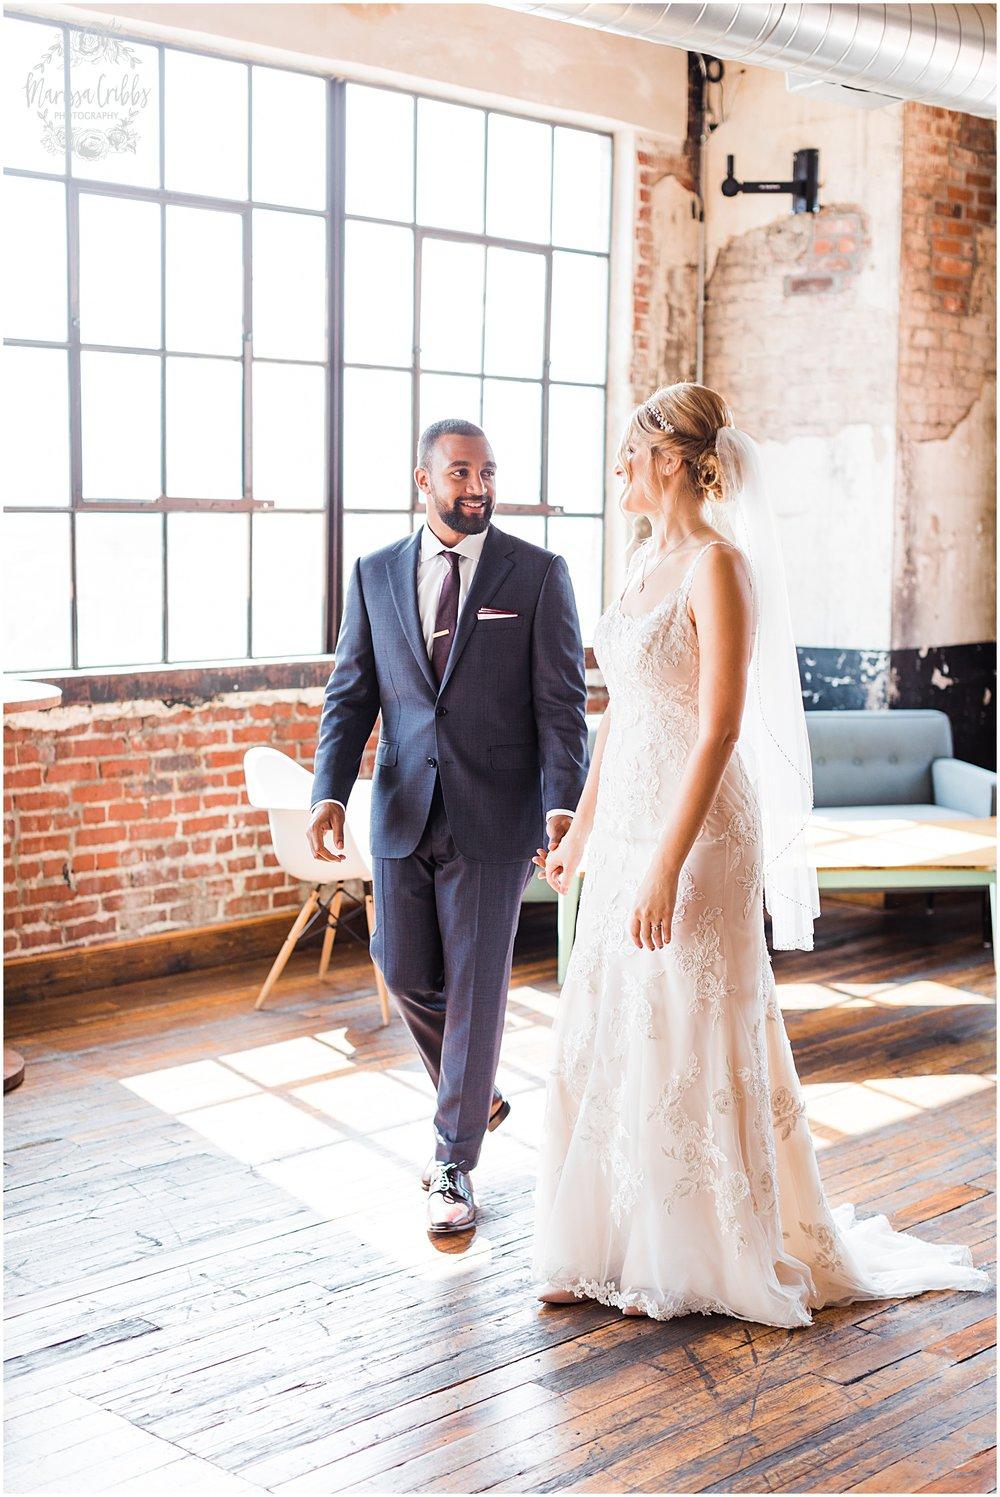 BAUER WEDDING | KELSEA & JUSTIN | MARISSA CRIBBS PHOTOGRAPHY_6510.jpg